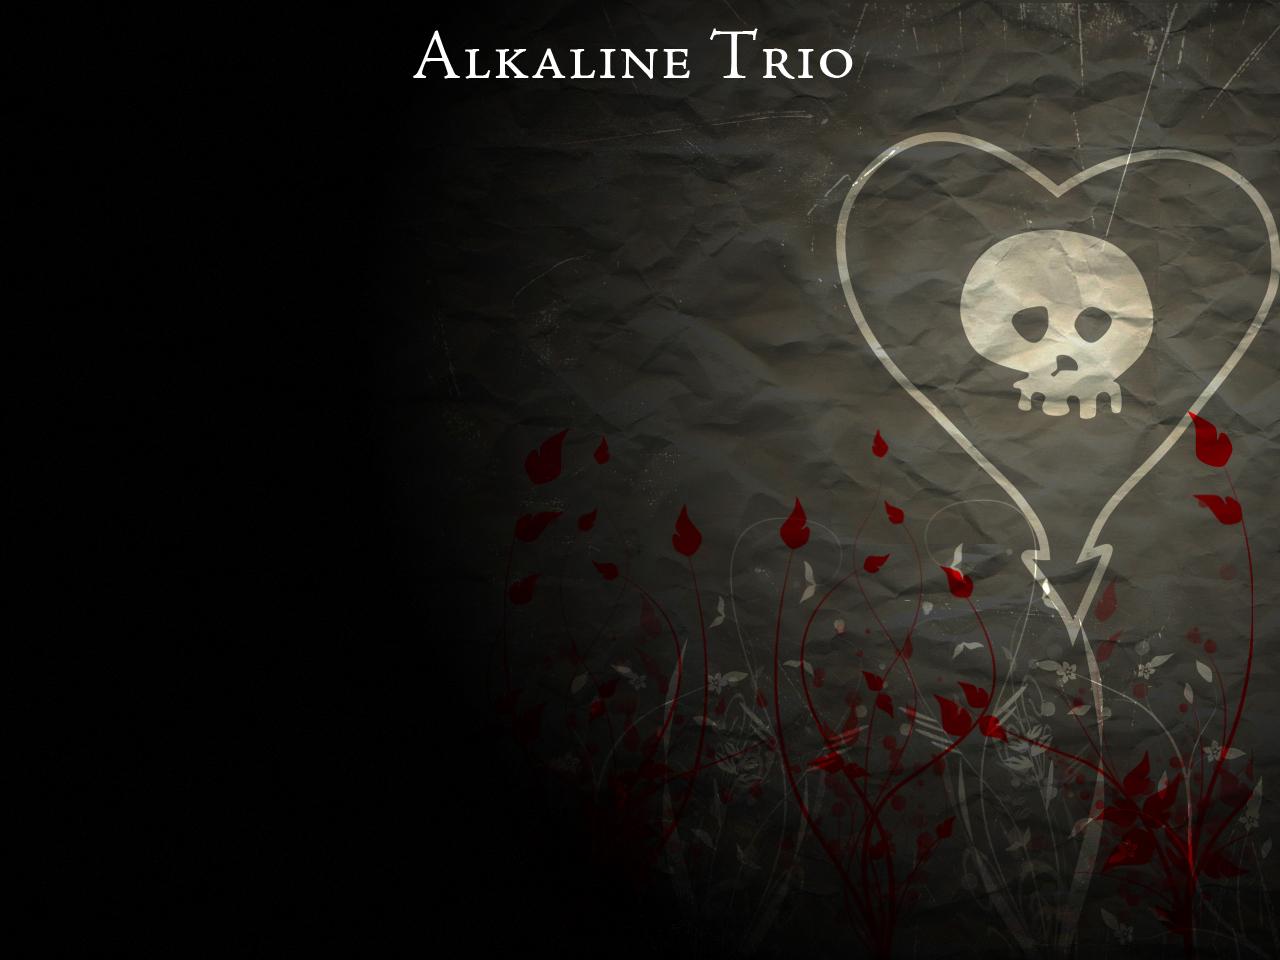 Alkaline Trio by appomattox